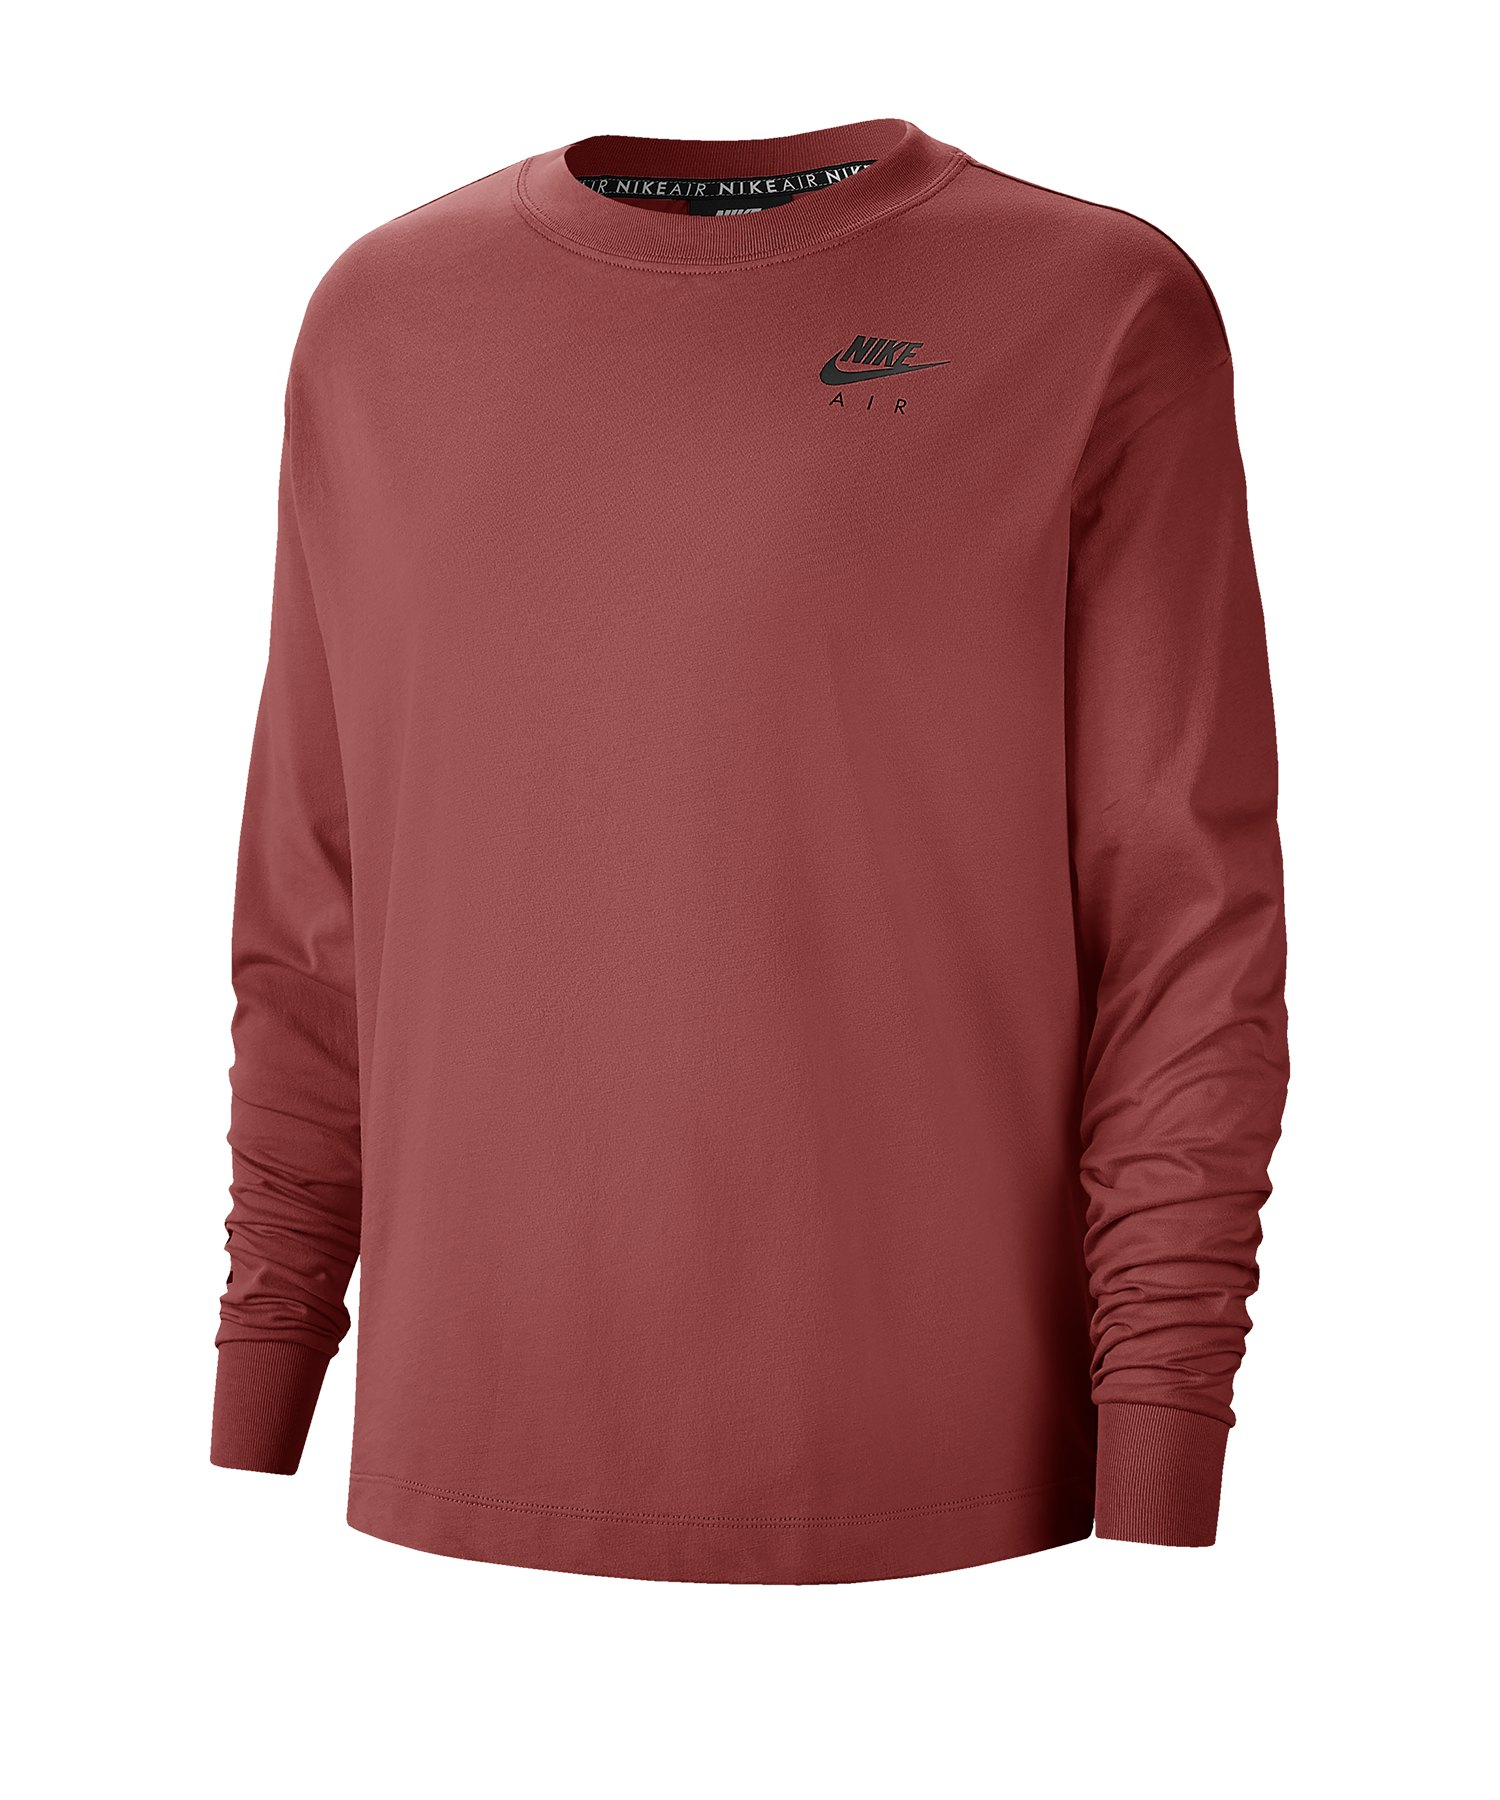 Nike Air Sweatshirt Damen Rot F661 - rot